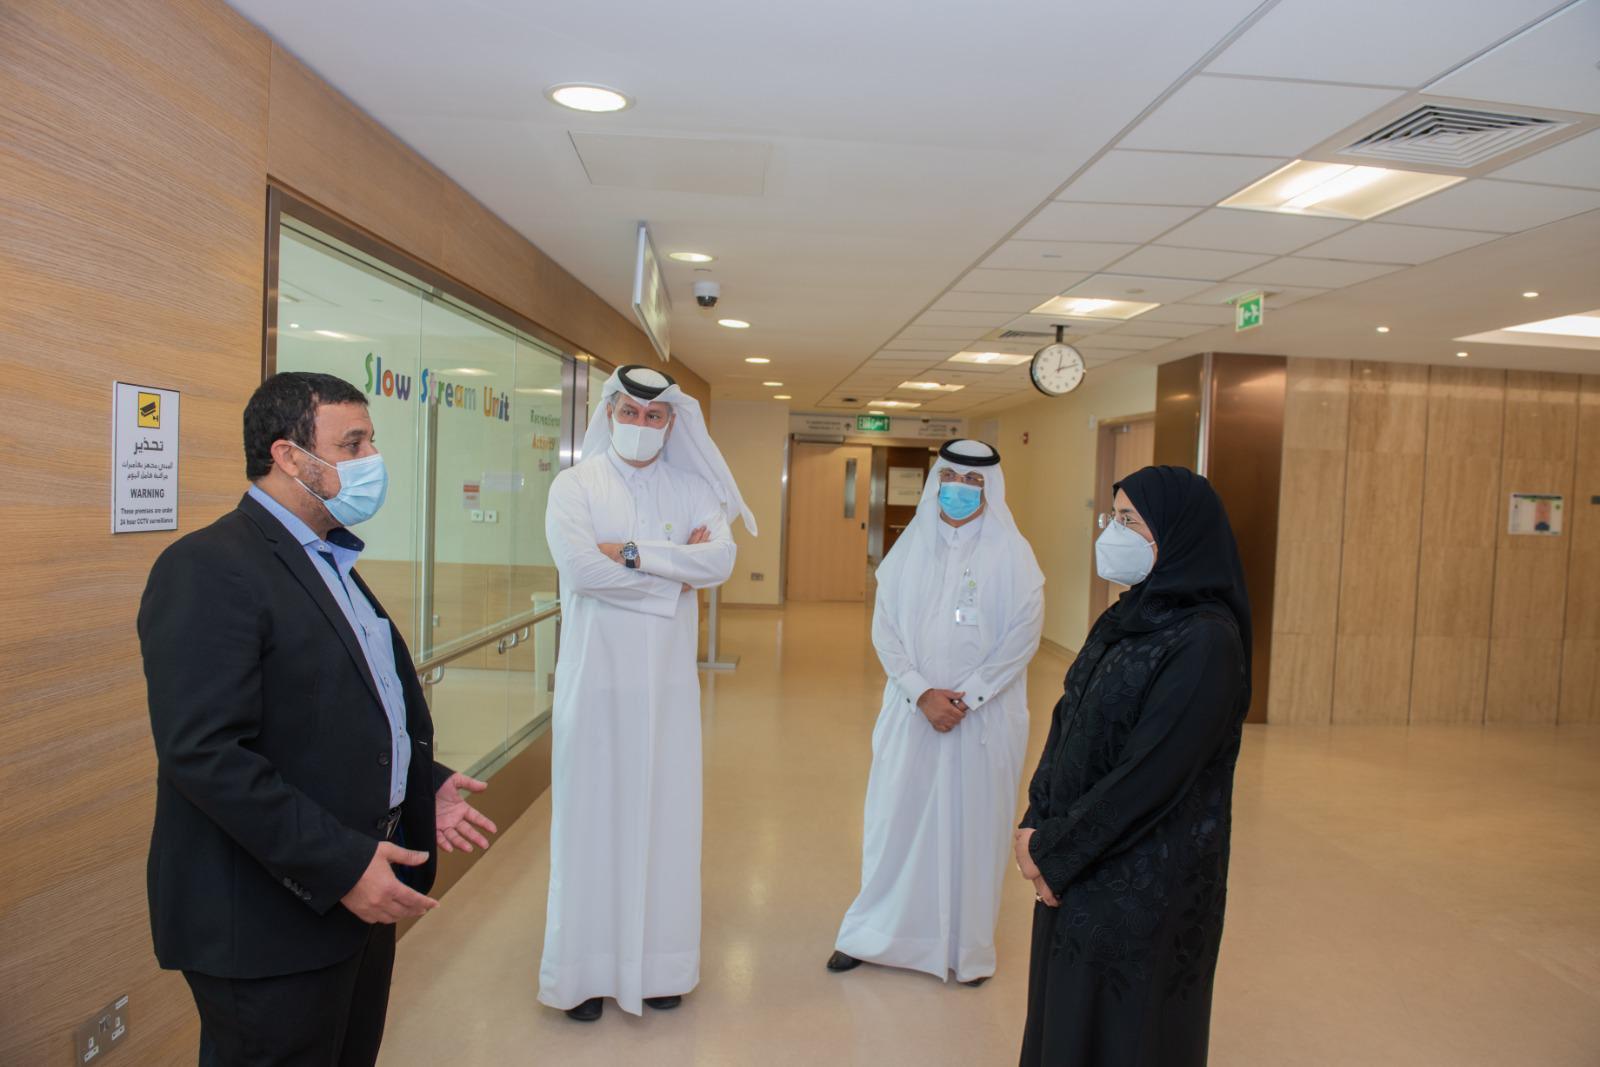 Minister Visits Post-COVID Inpatient Unit Inside Qatar Rehabilitation Institute